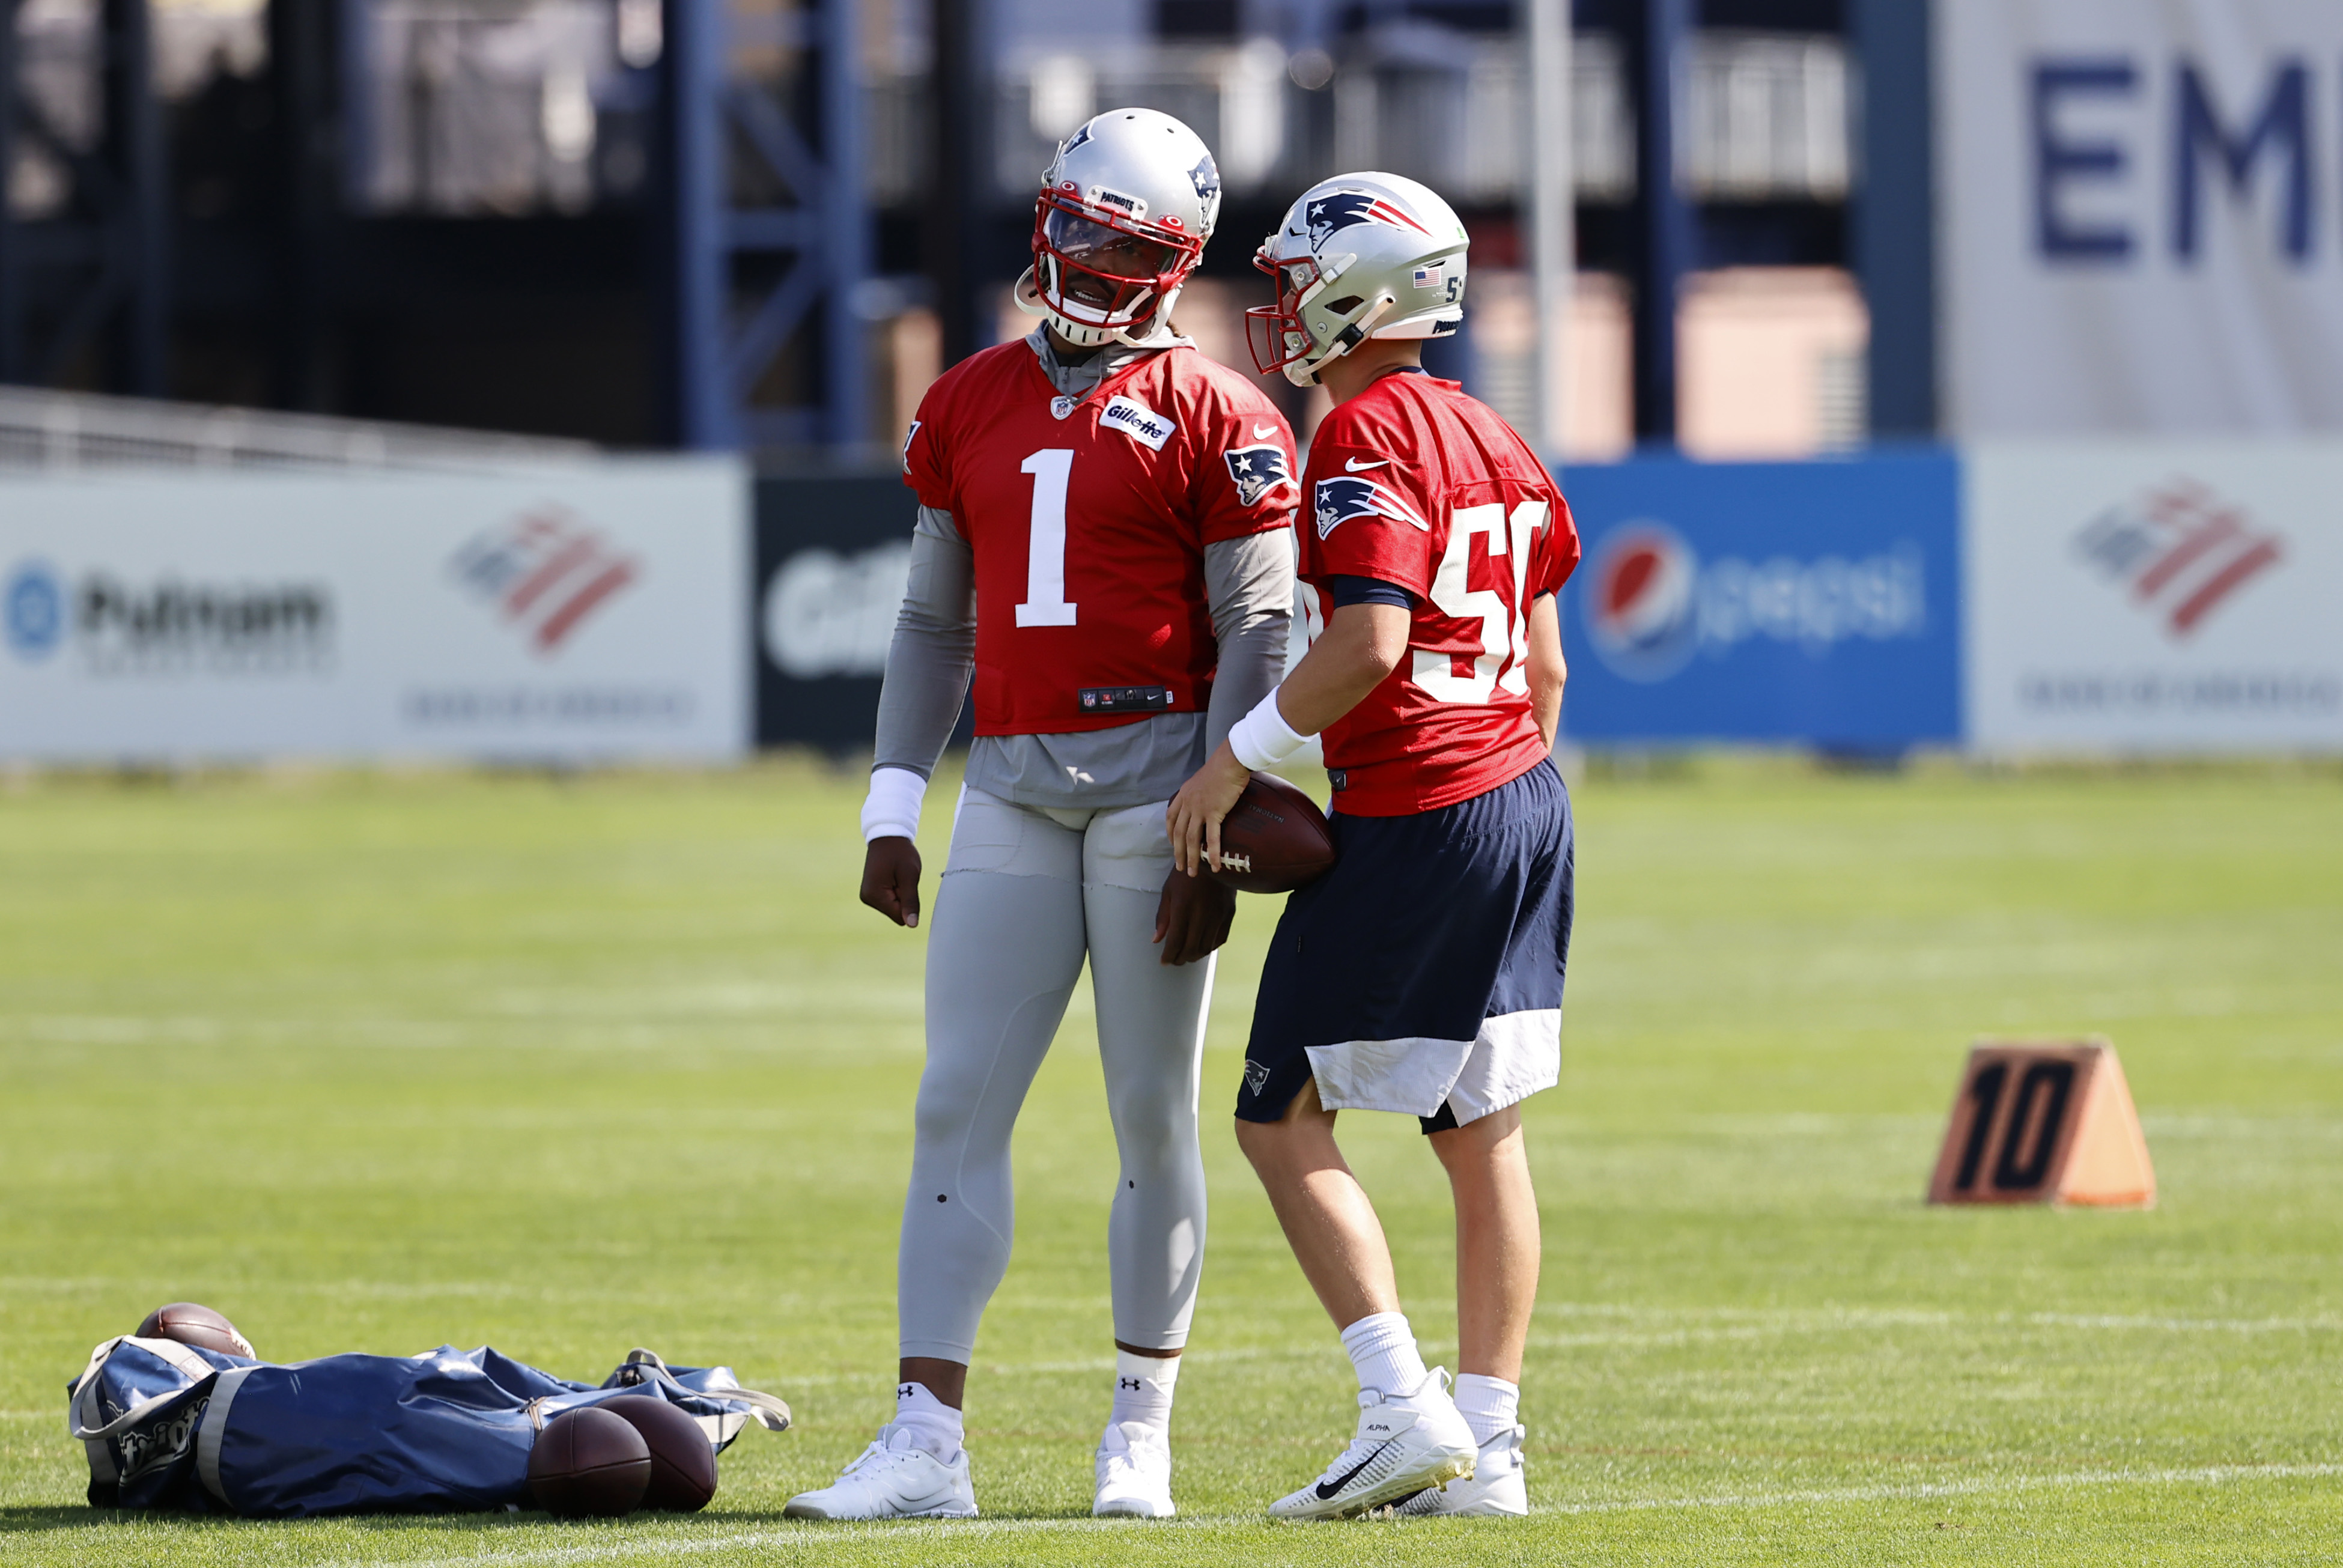 NFL: JUL 30 New England Patriots Training Camp